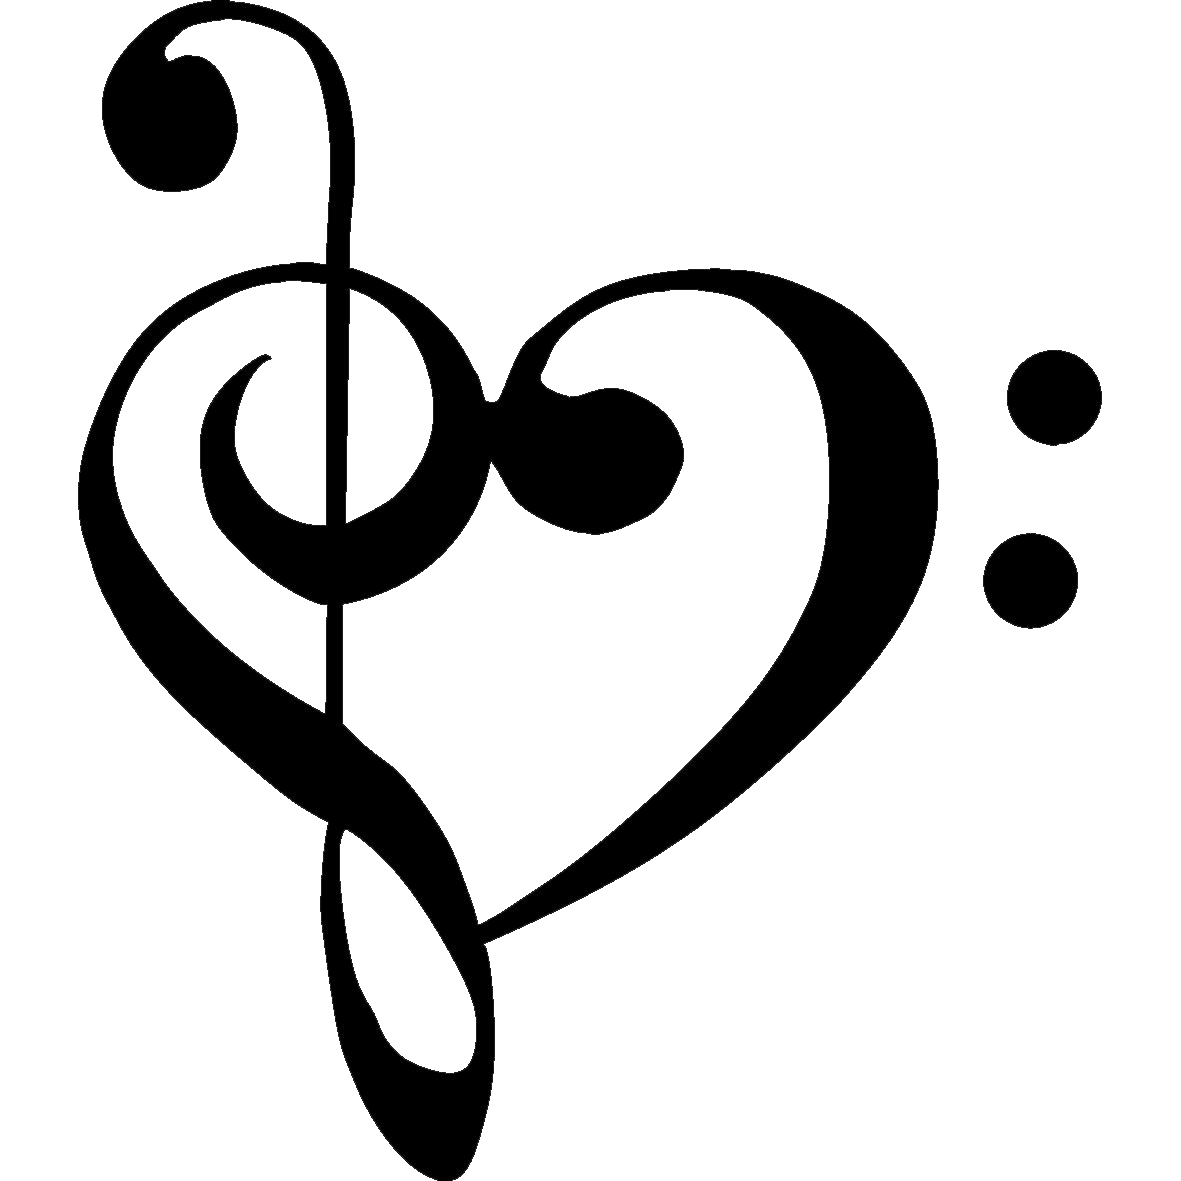 Heart skeleton key clipart clip library tumblr_mk62c2Nkb11s5jjtzo1_1280.png (1181×1181) | Dessins et ... clip library